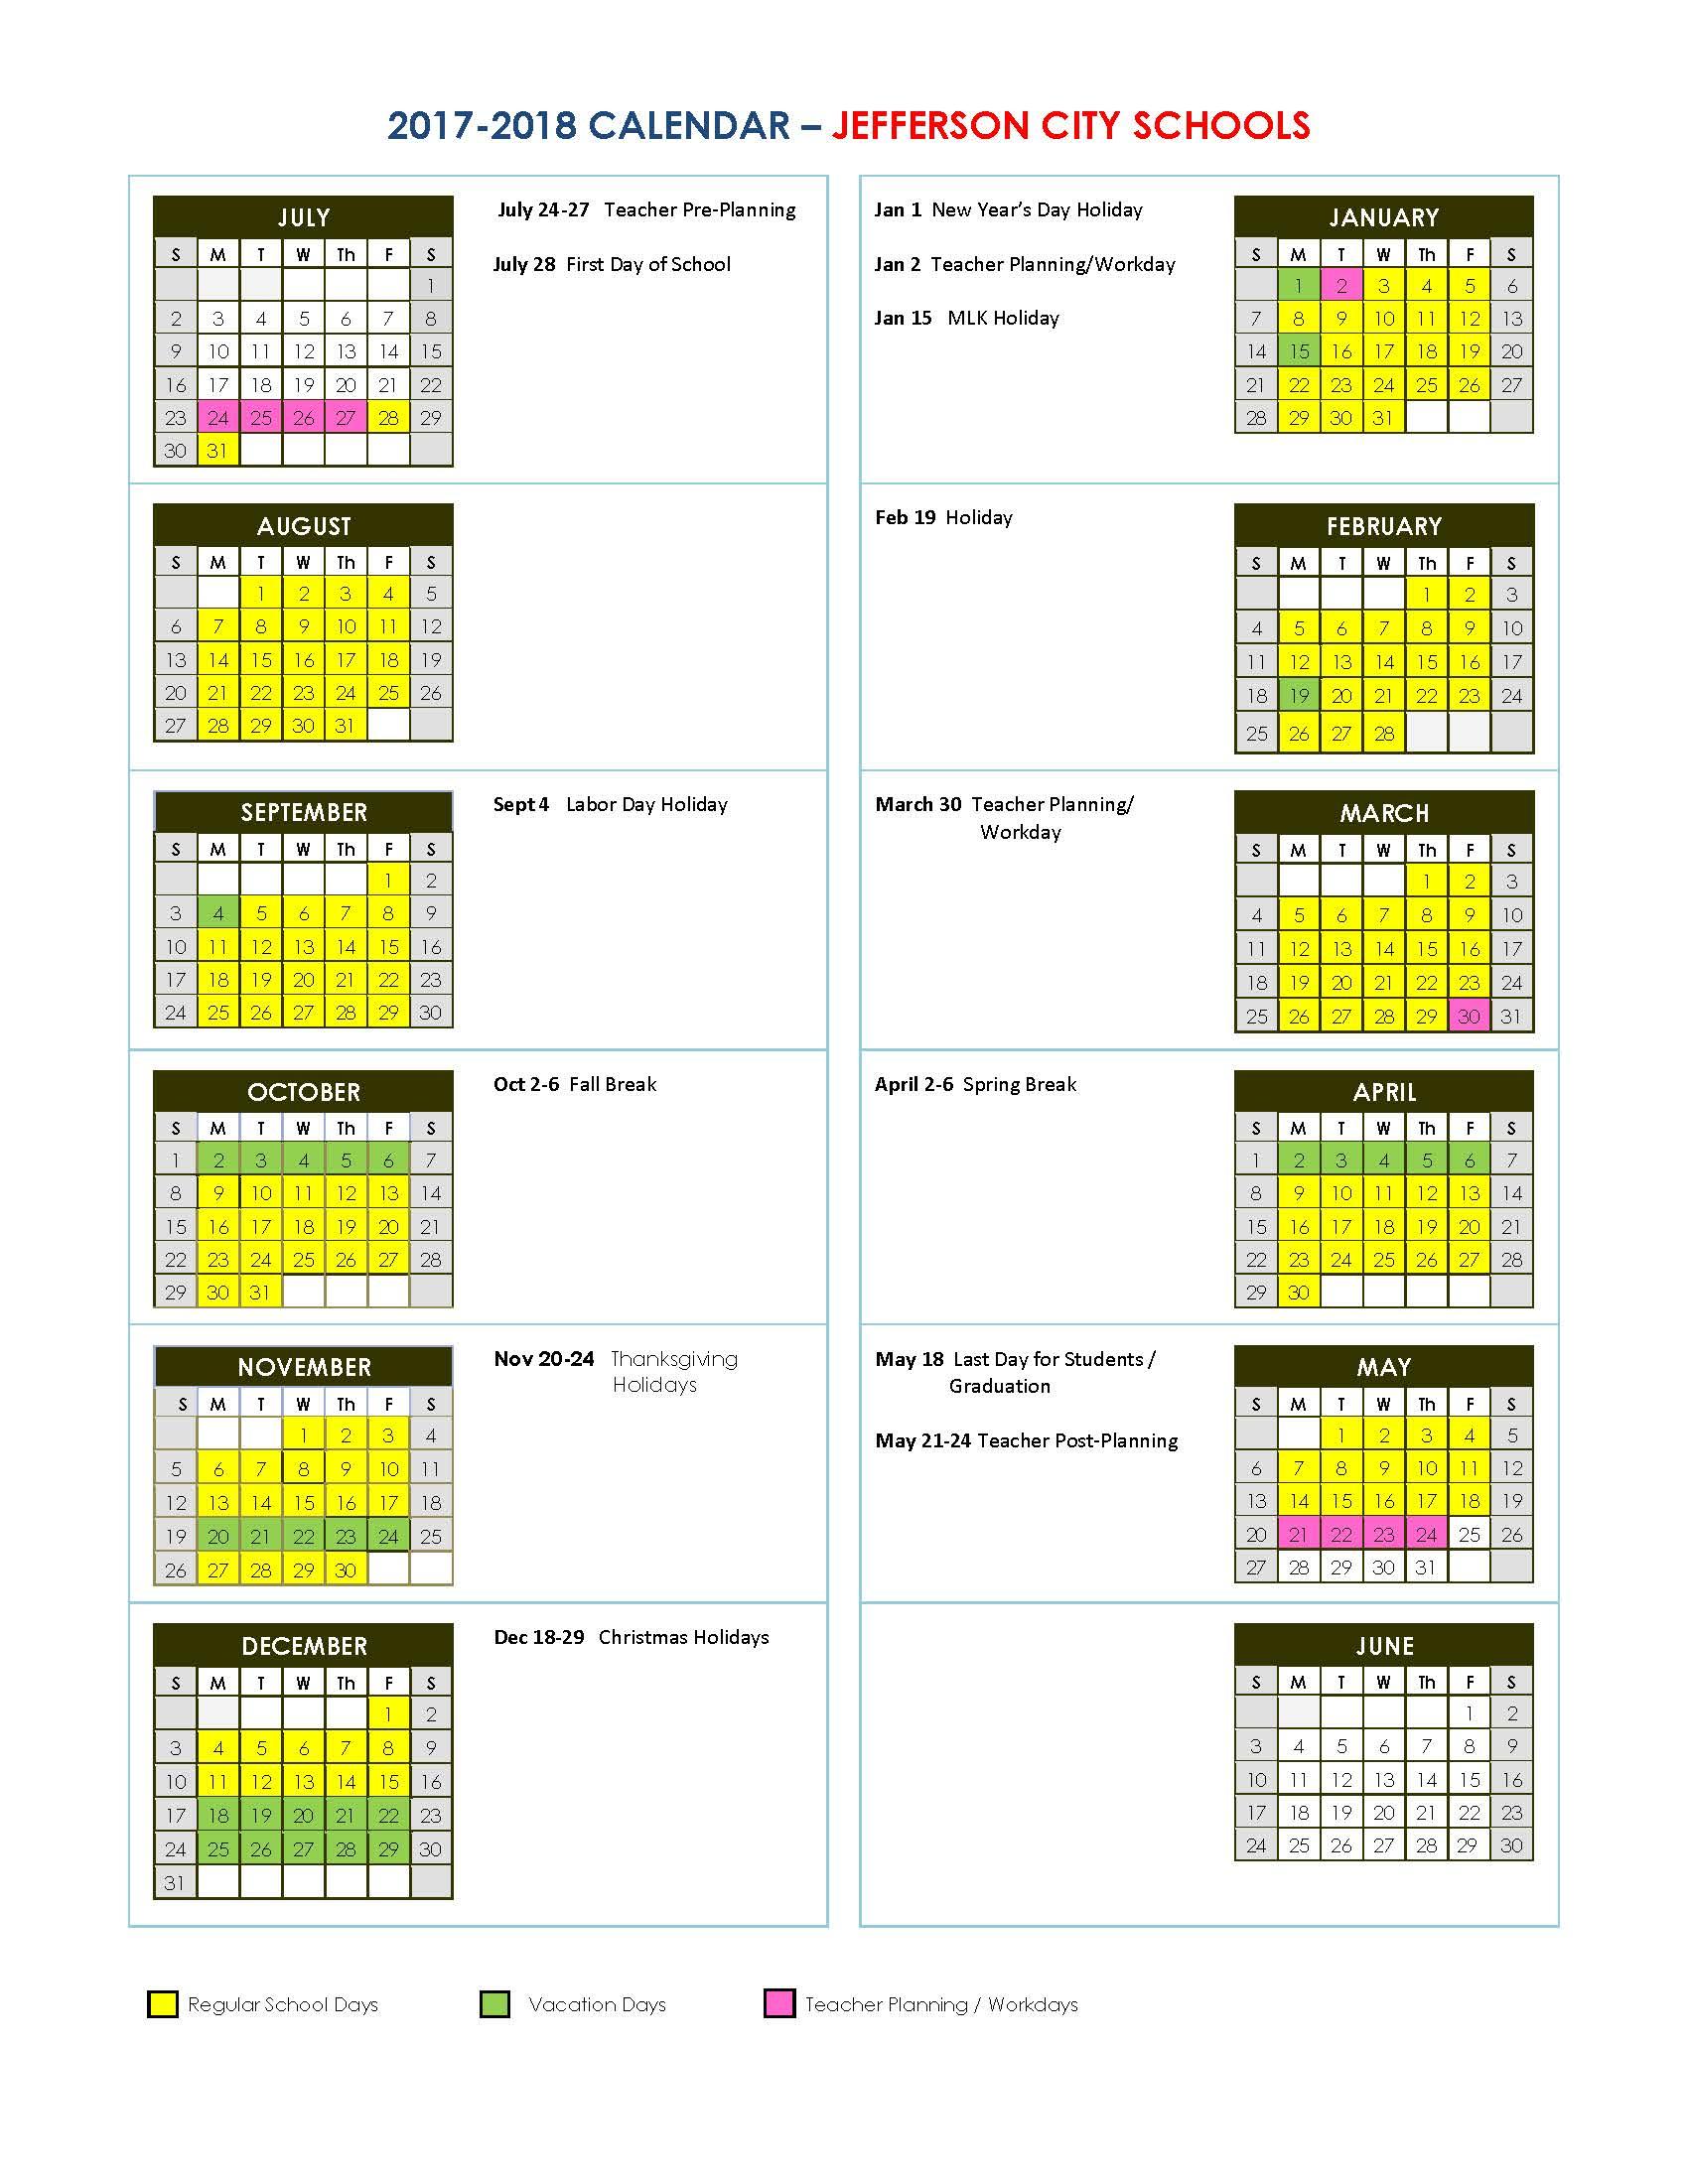 Jefferson City High School Pertaining To New Jersey School Public Educatiom Calendar